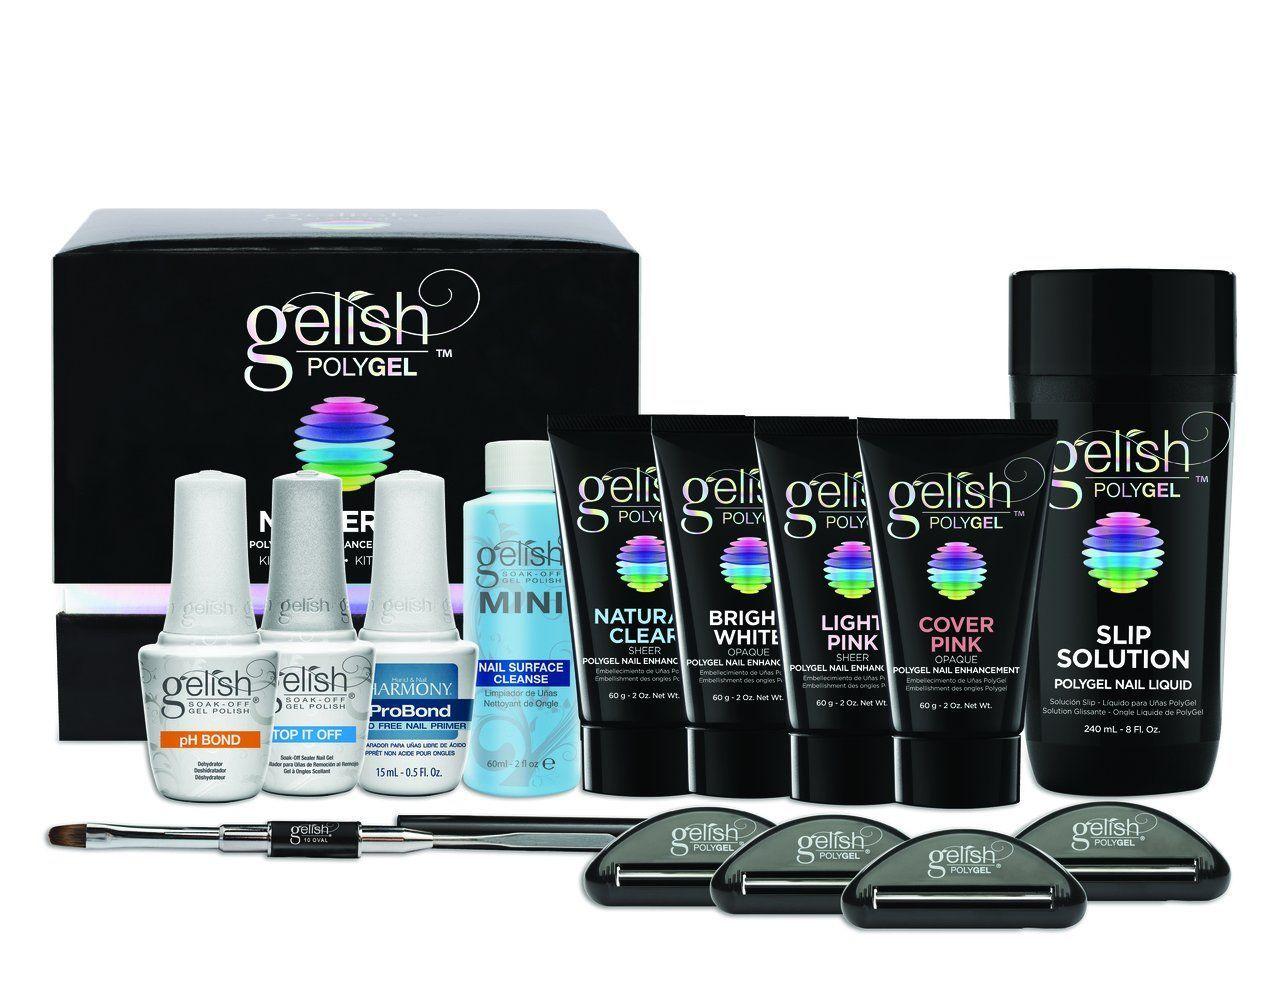 Harmony Gelish Poly Gel Master Kit Nail Kit Gelish Polygel Nail Harmony